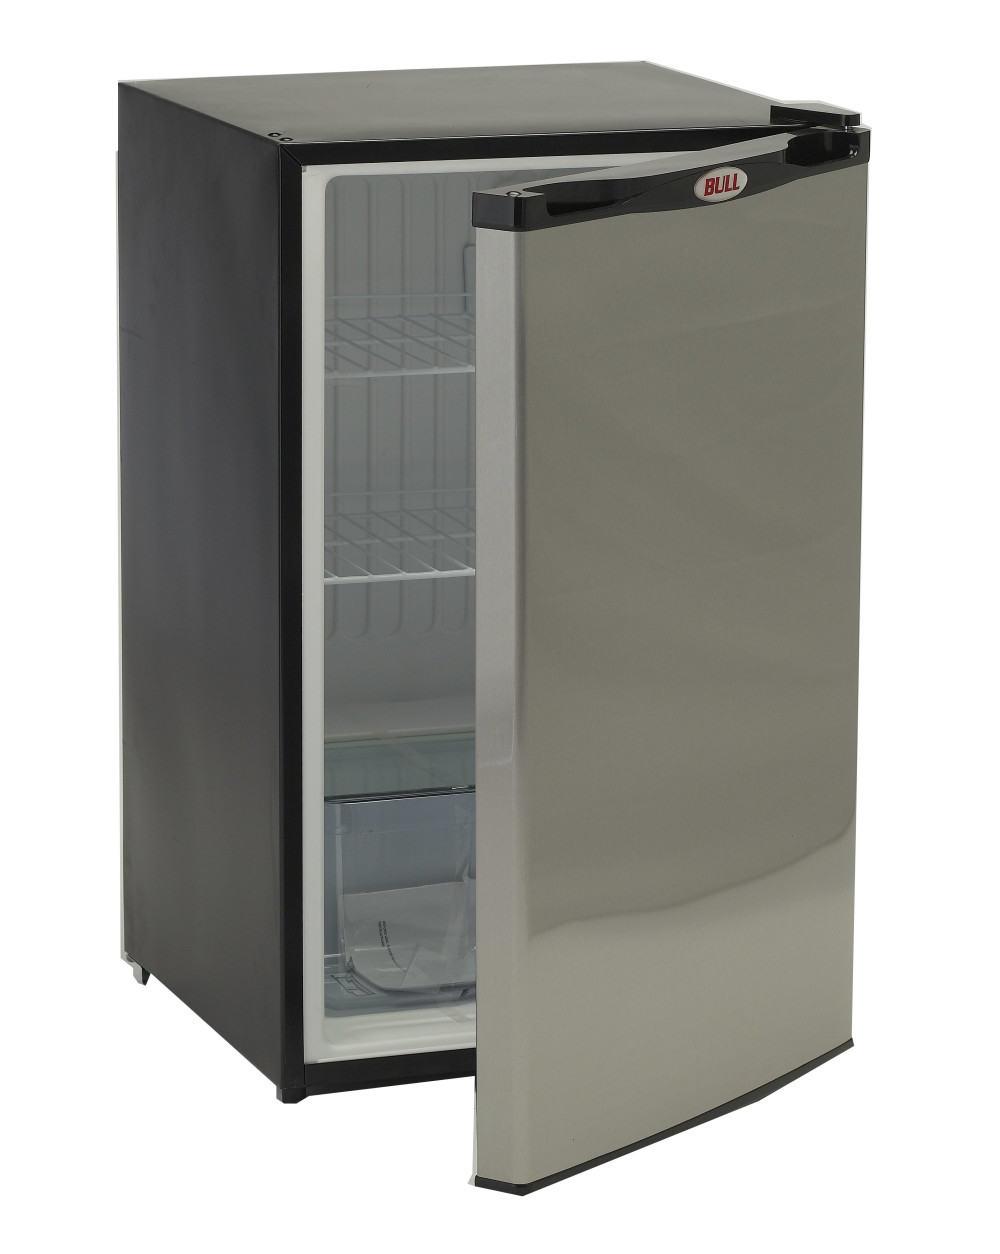 Bull 4.5 Cu. Ft. Compact Refrigerator ...